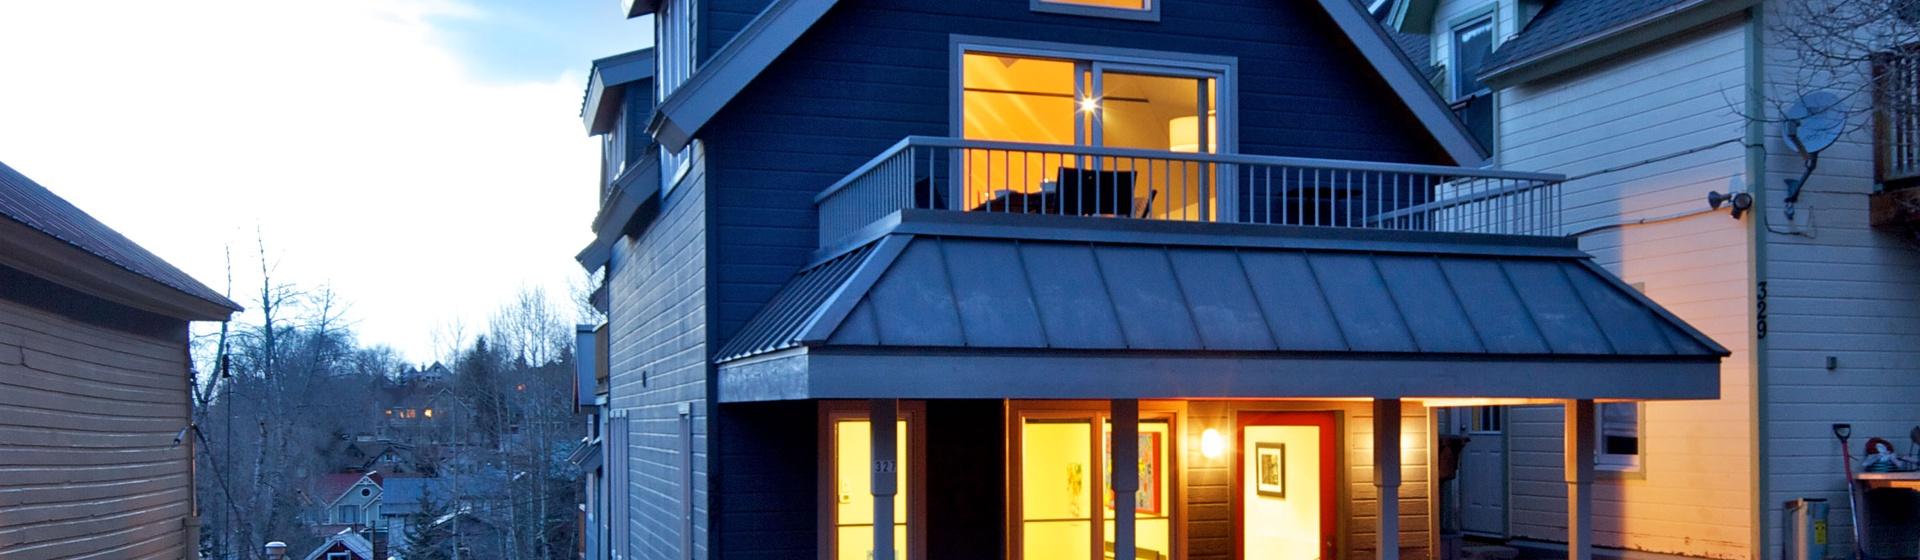 1-Telluride-NorthWillow-Ext.jpg